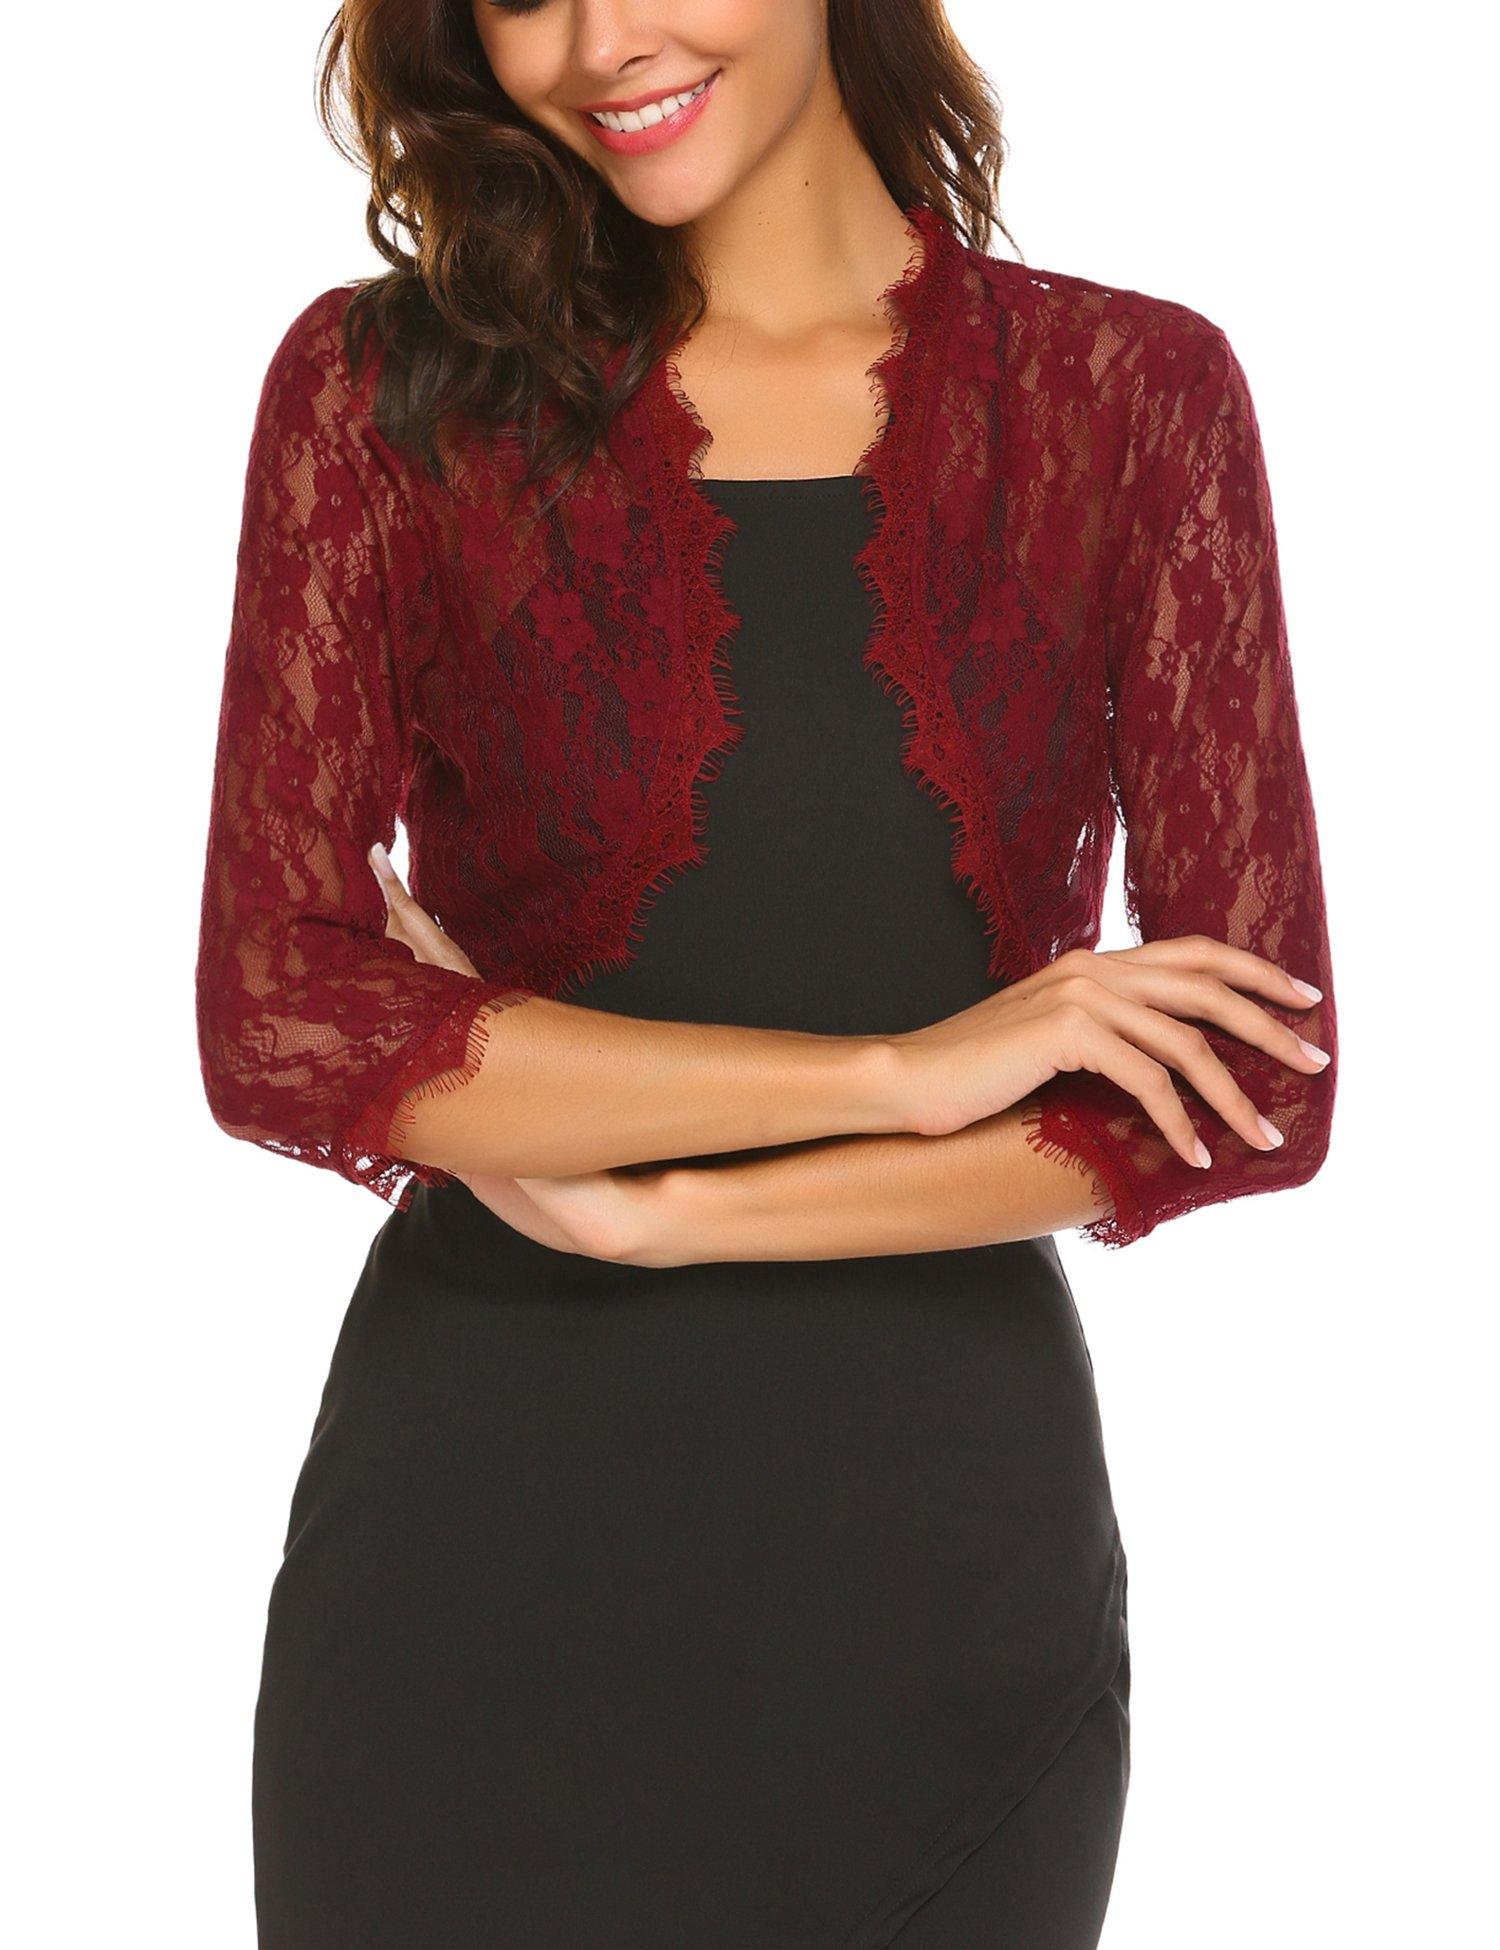 SE MIU Women's 3/4 Sleeve Lace Bolero Shrug Crochet Cardigan Top